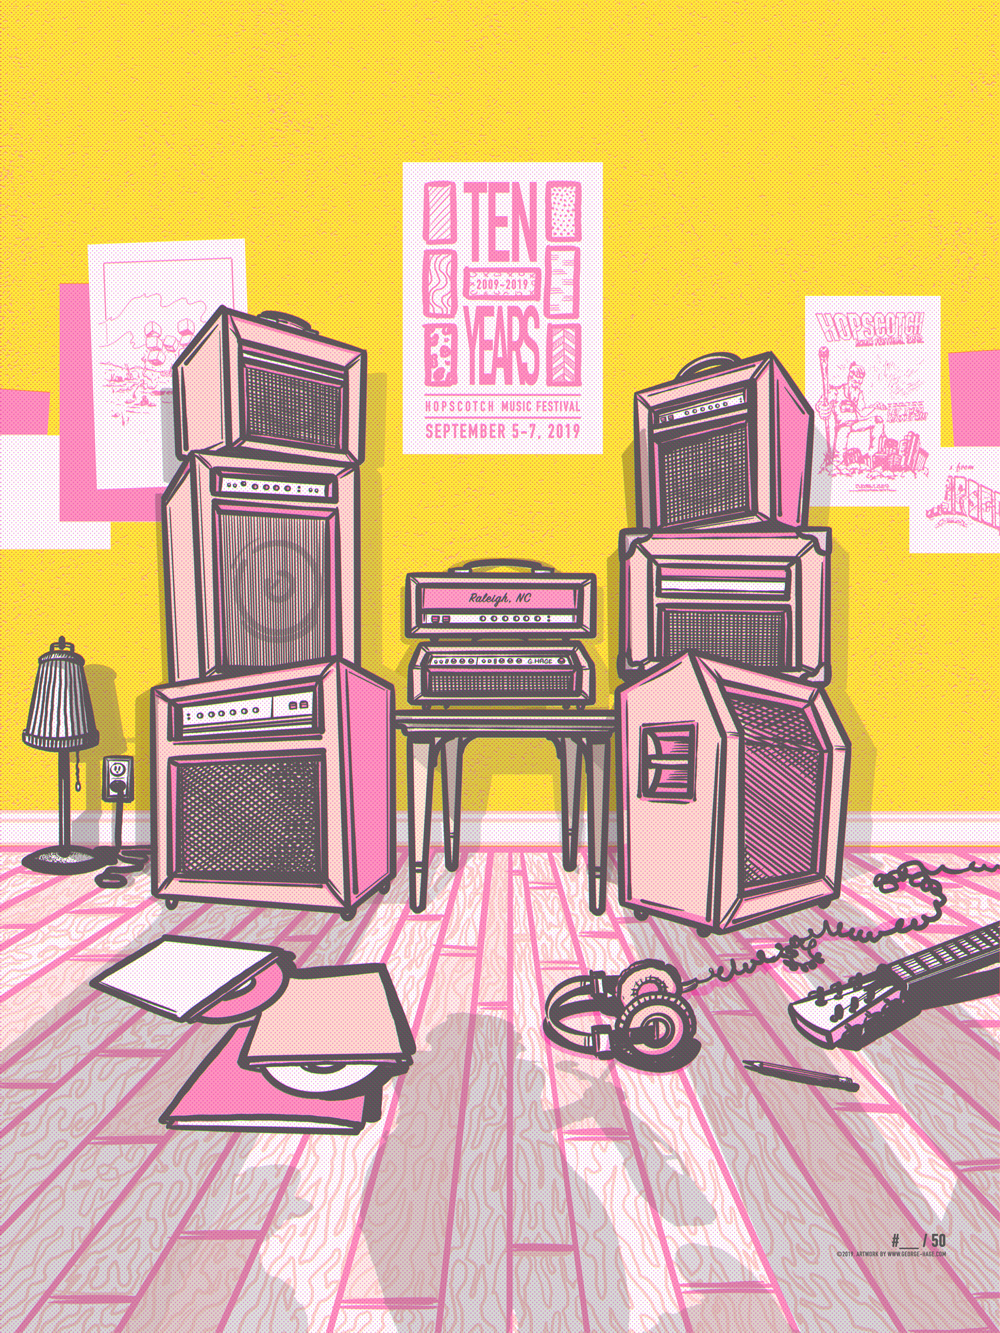 Hopscotch2019_Poster-George-Hage-18x24-WEB.jpg